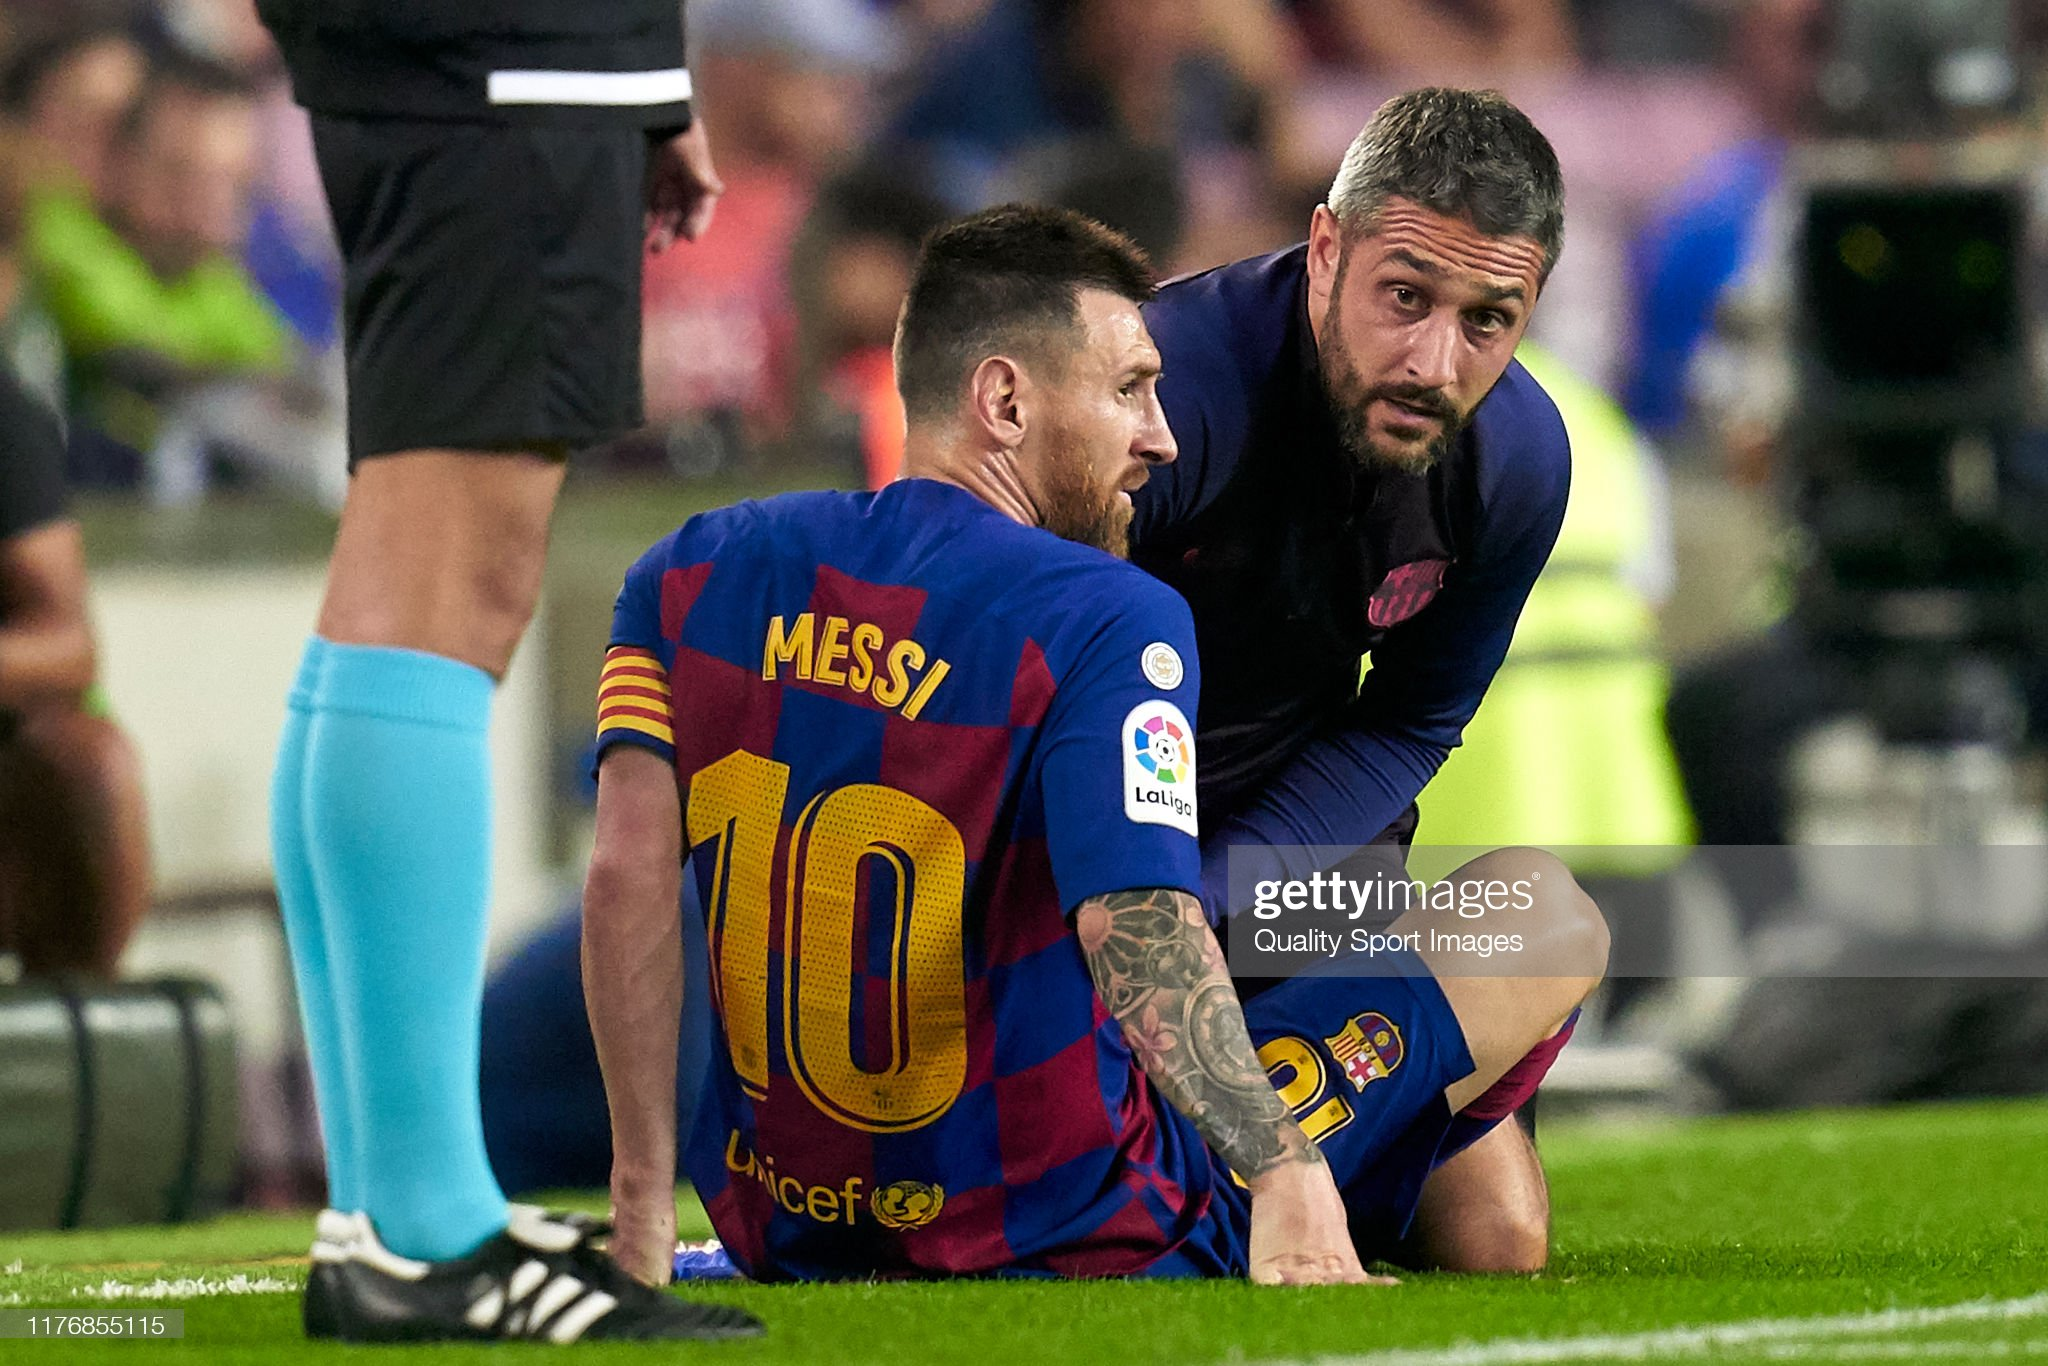 صور مباراة : برشلونة - فياريال 2-1 ( 24-09-2019 )  Lionel-messi-of-fc-barcelona-injured-over-the-pitch-during-the-liga-picture-id1176855115?s=2048x2048